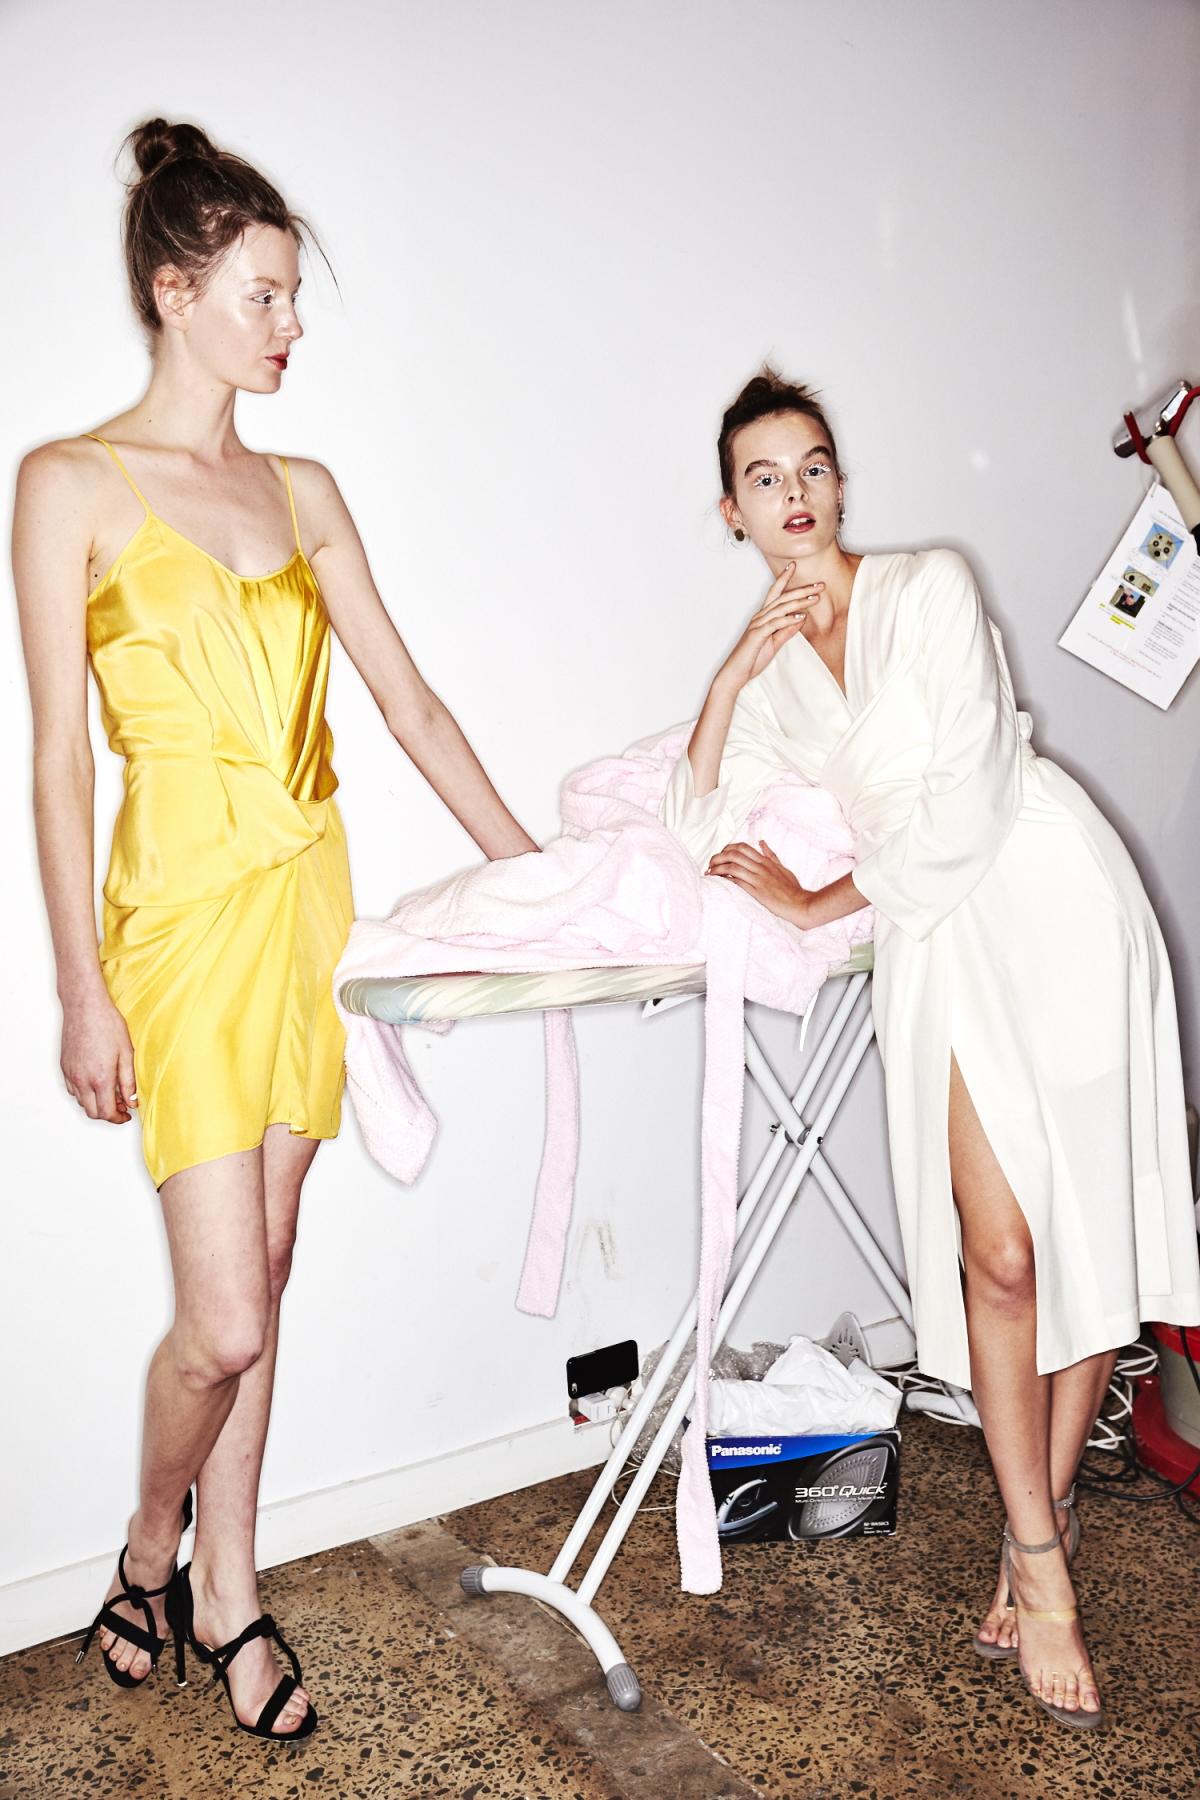 Gary Bigeni Resort 2018 Fashion Show Sydney Backstage